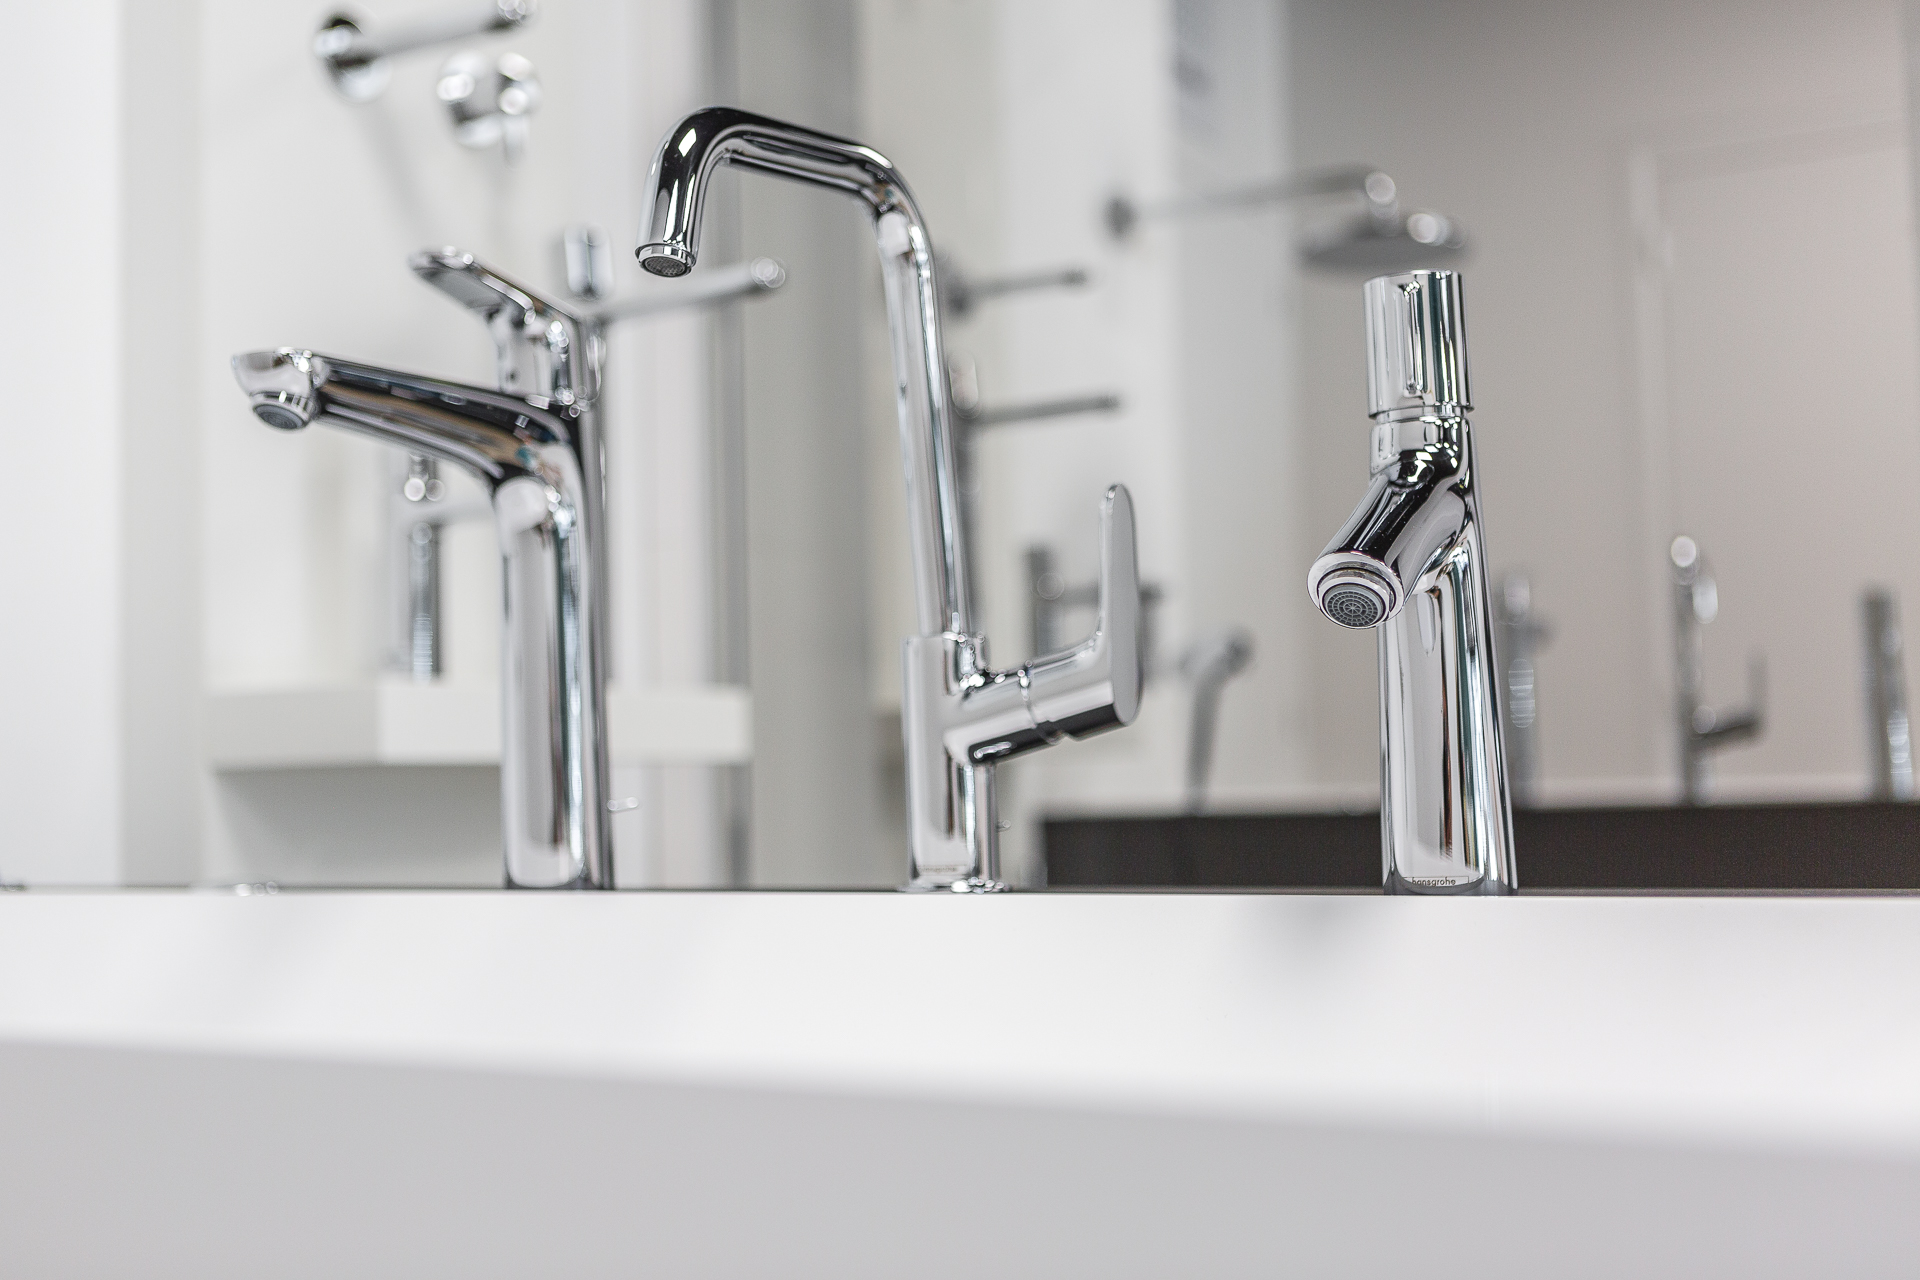 robinets chomés